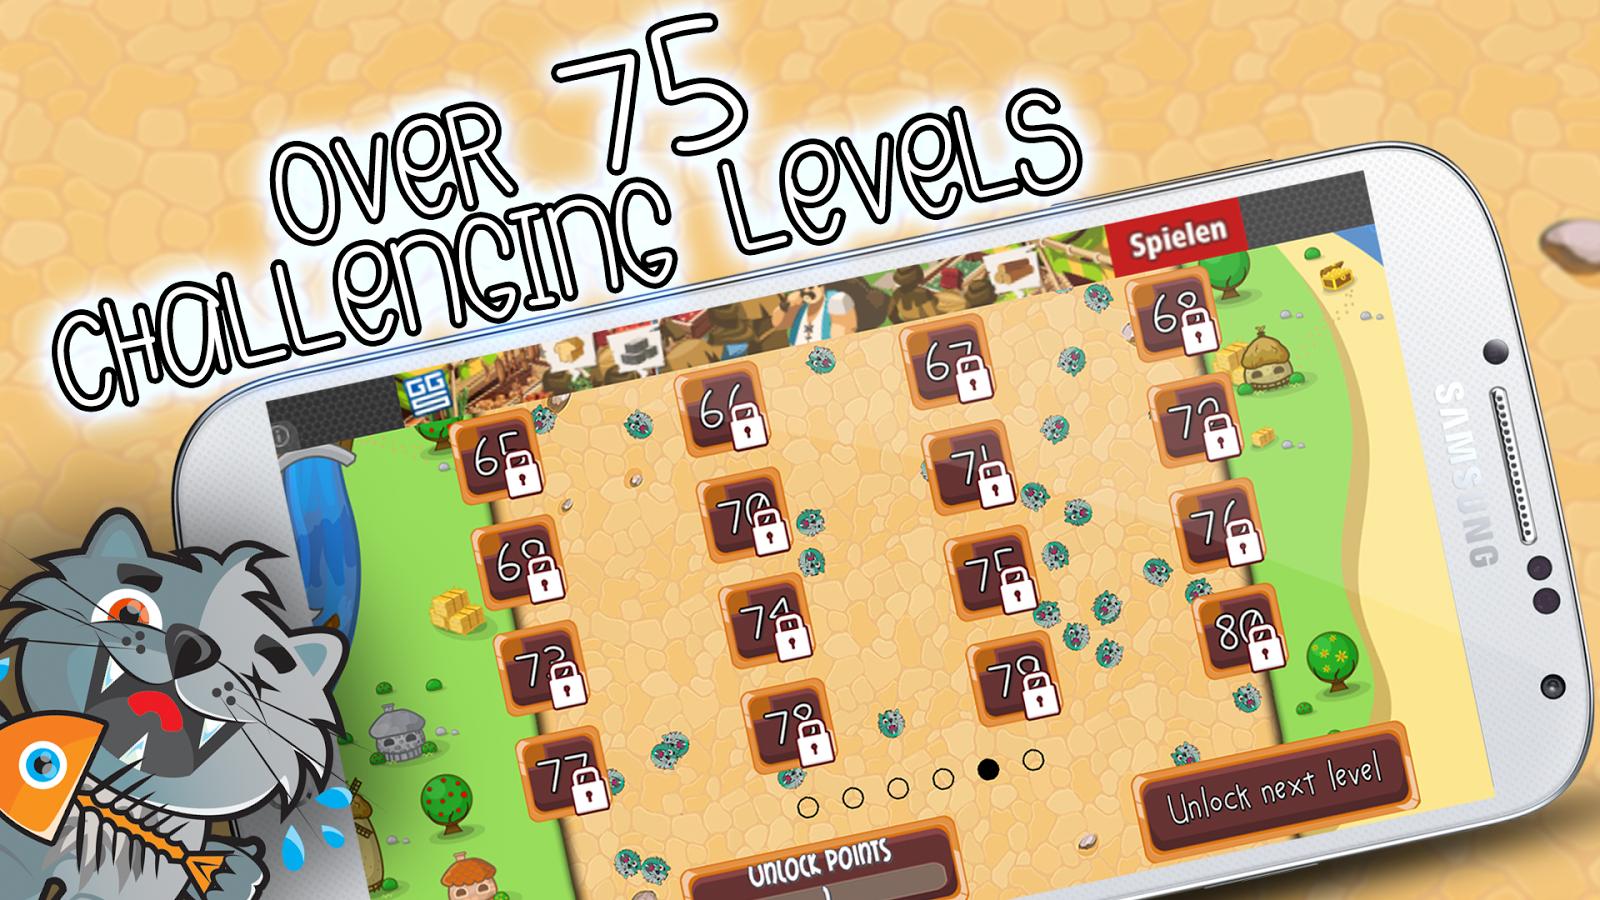 Cat Smashing Game Android